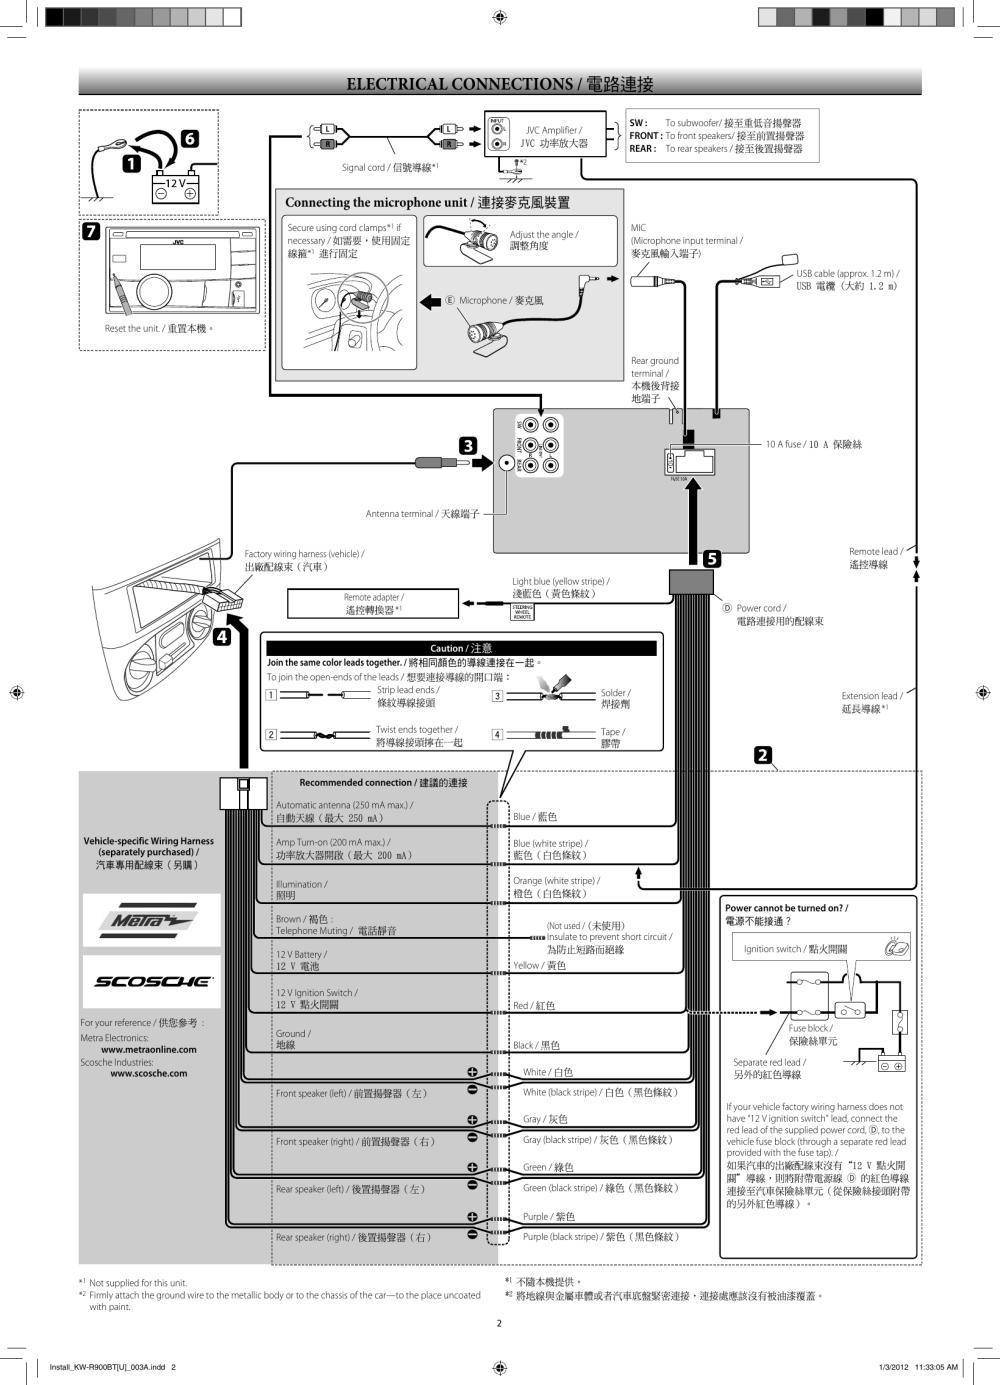 medium resolution of card bacnet wiring diagram emerson wiring diagram autovehicle card bacnet wiring diagram emerson